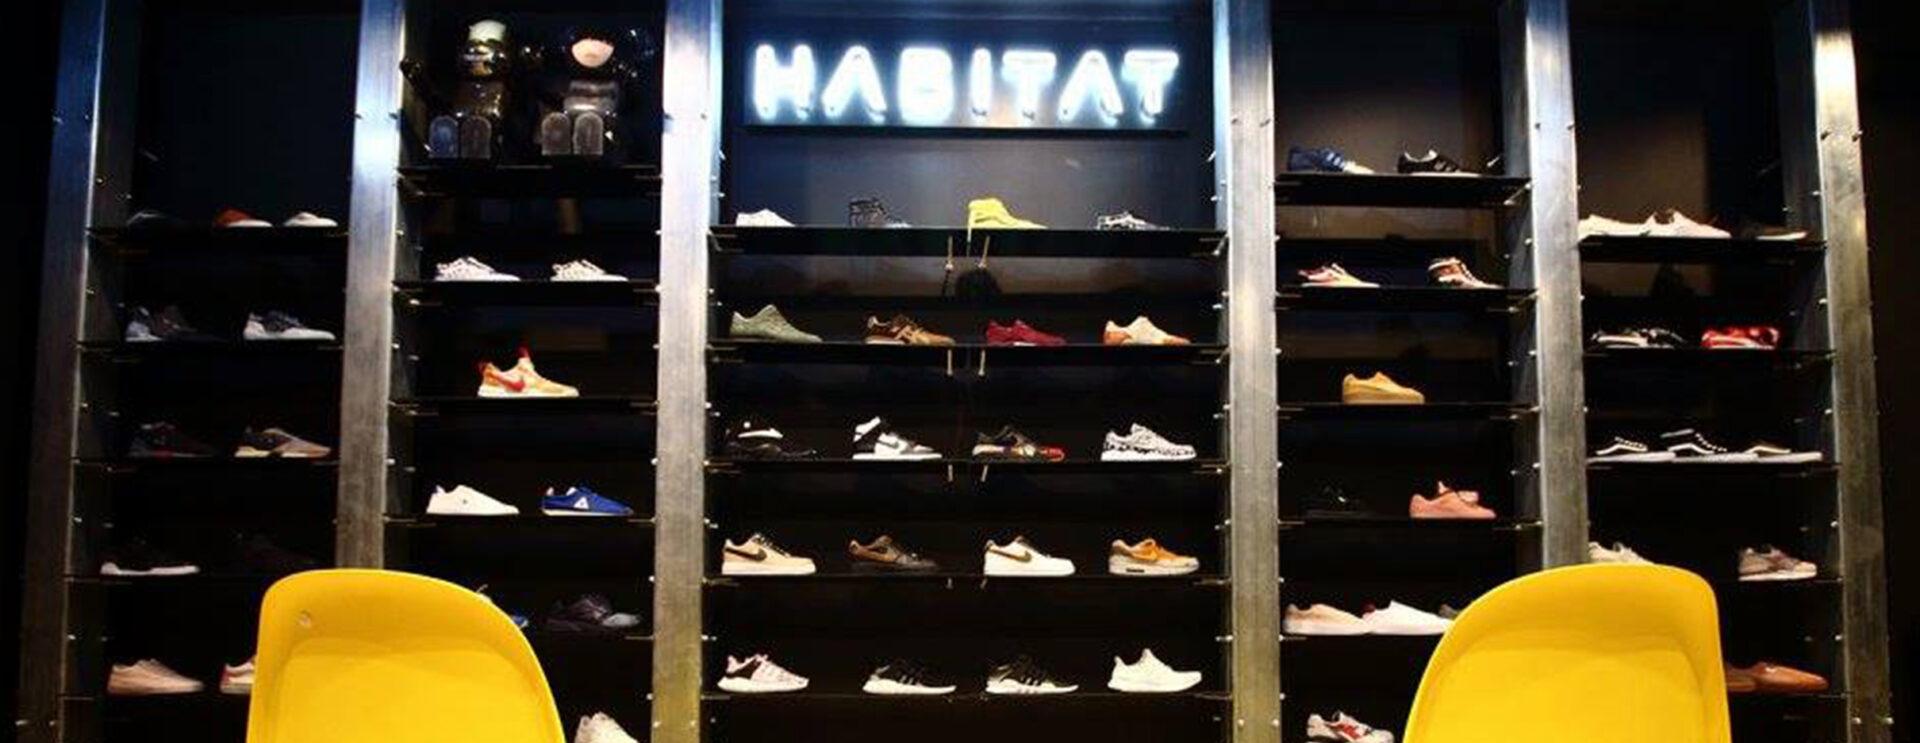 HABITAT_